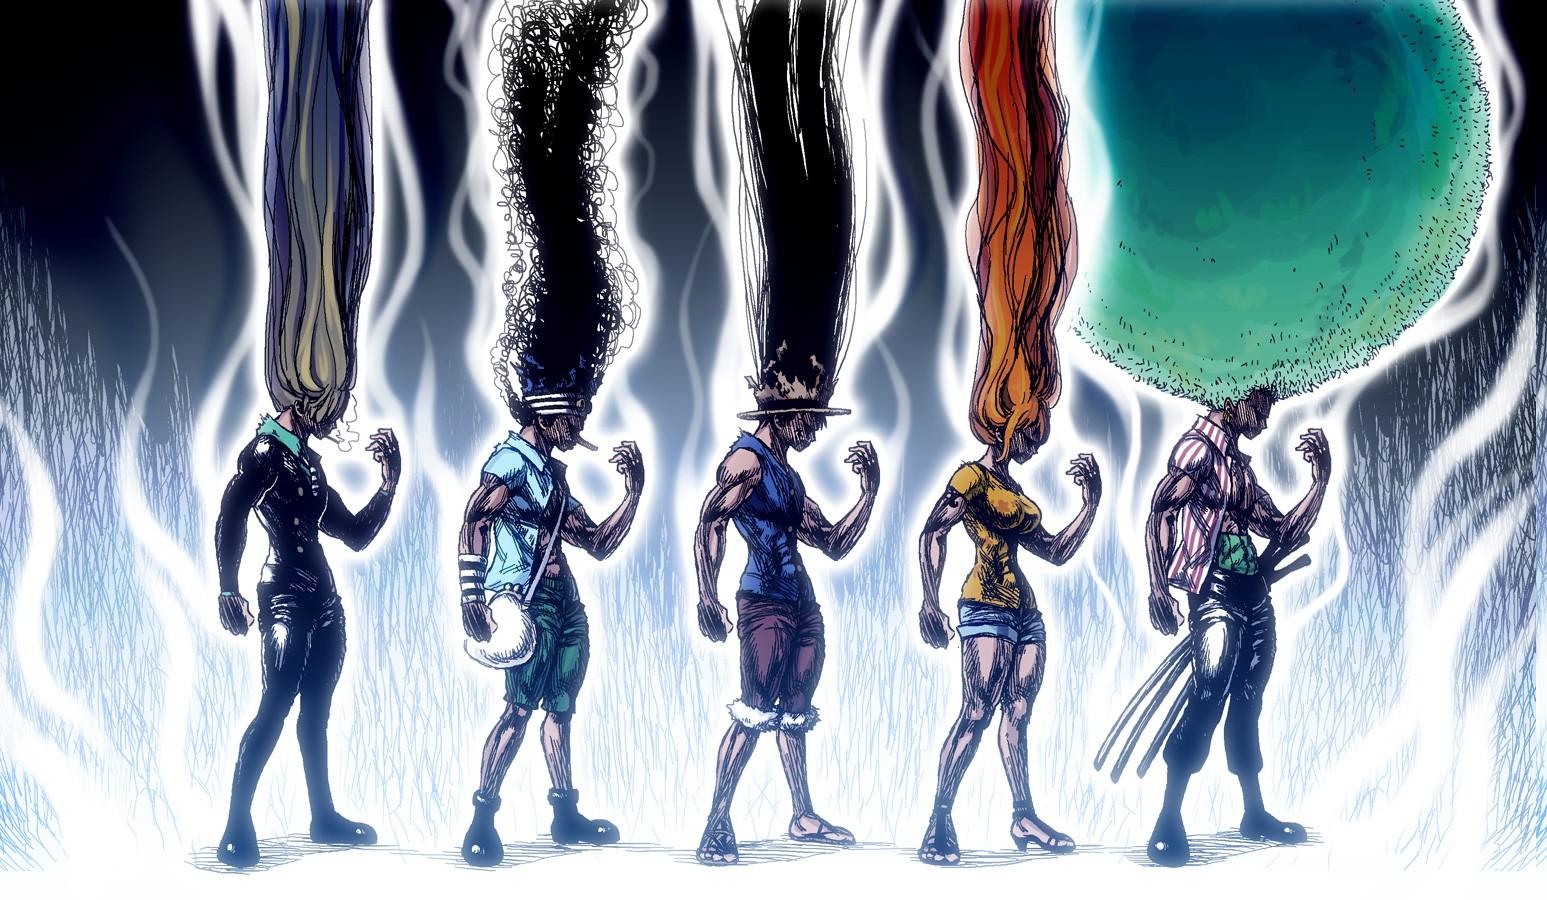 Illustration Anime Crossover Graphic Design Hunter X One Piece Sanji Monkey D Luffy Roronoa Zoro